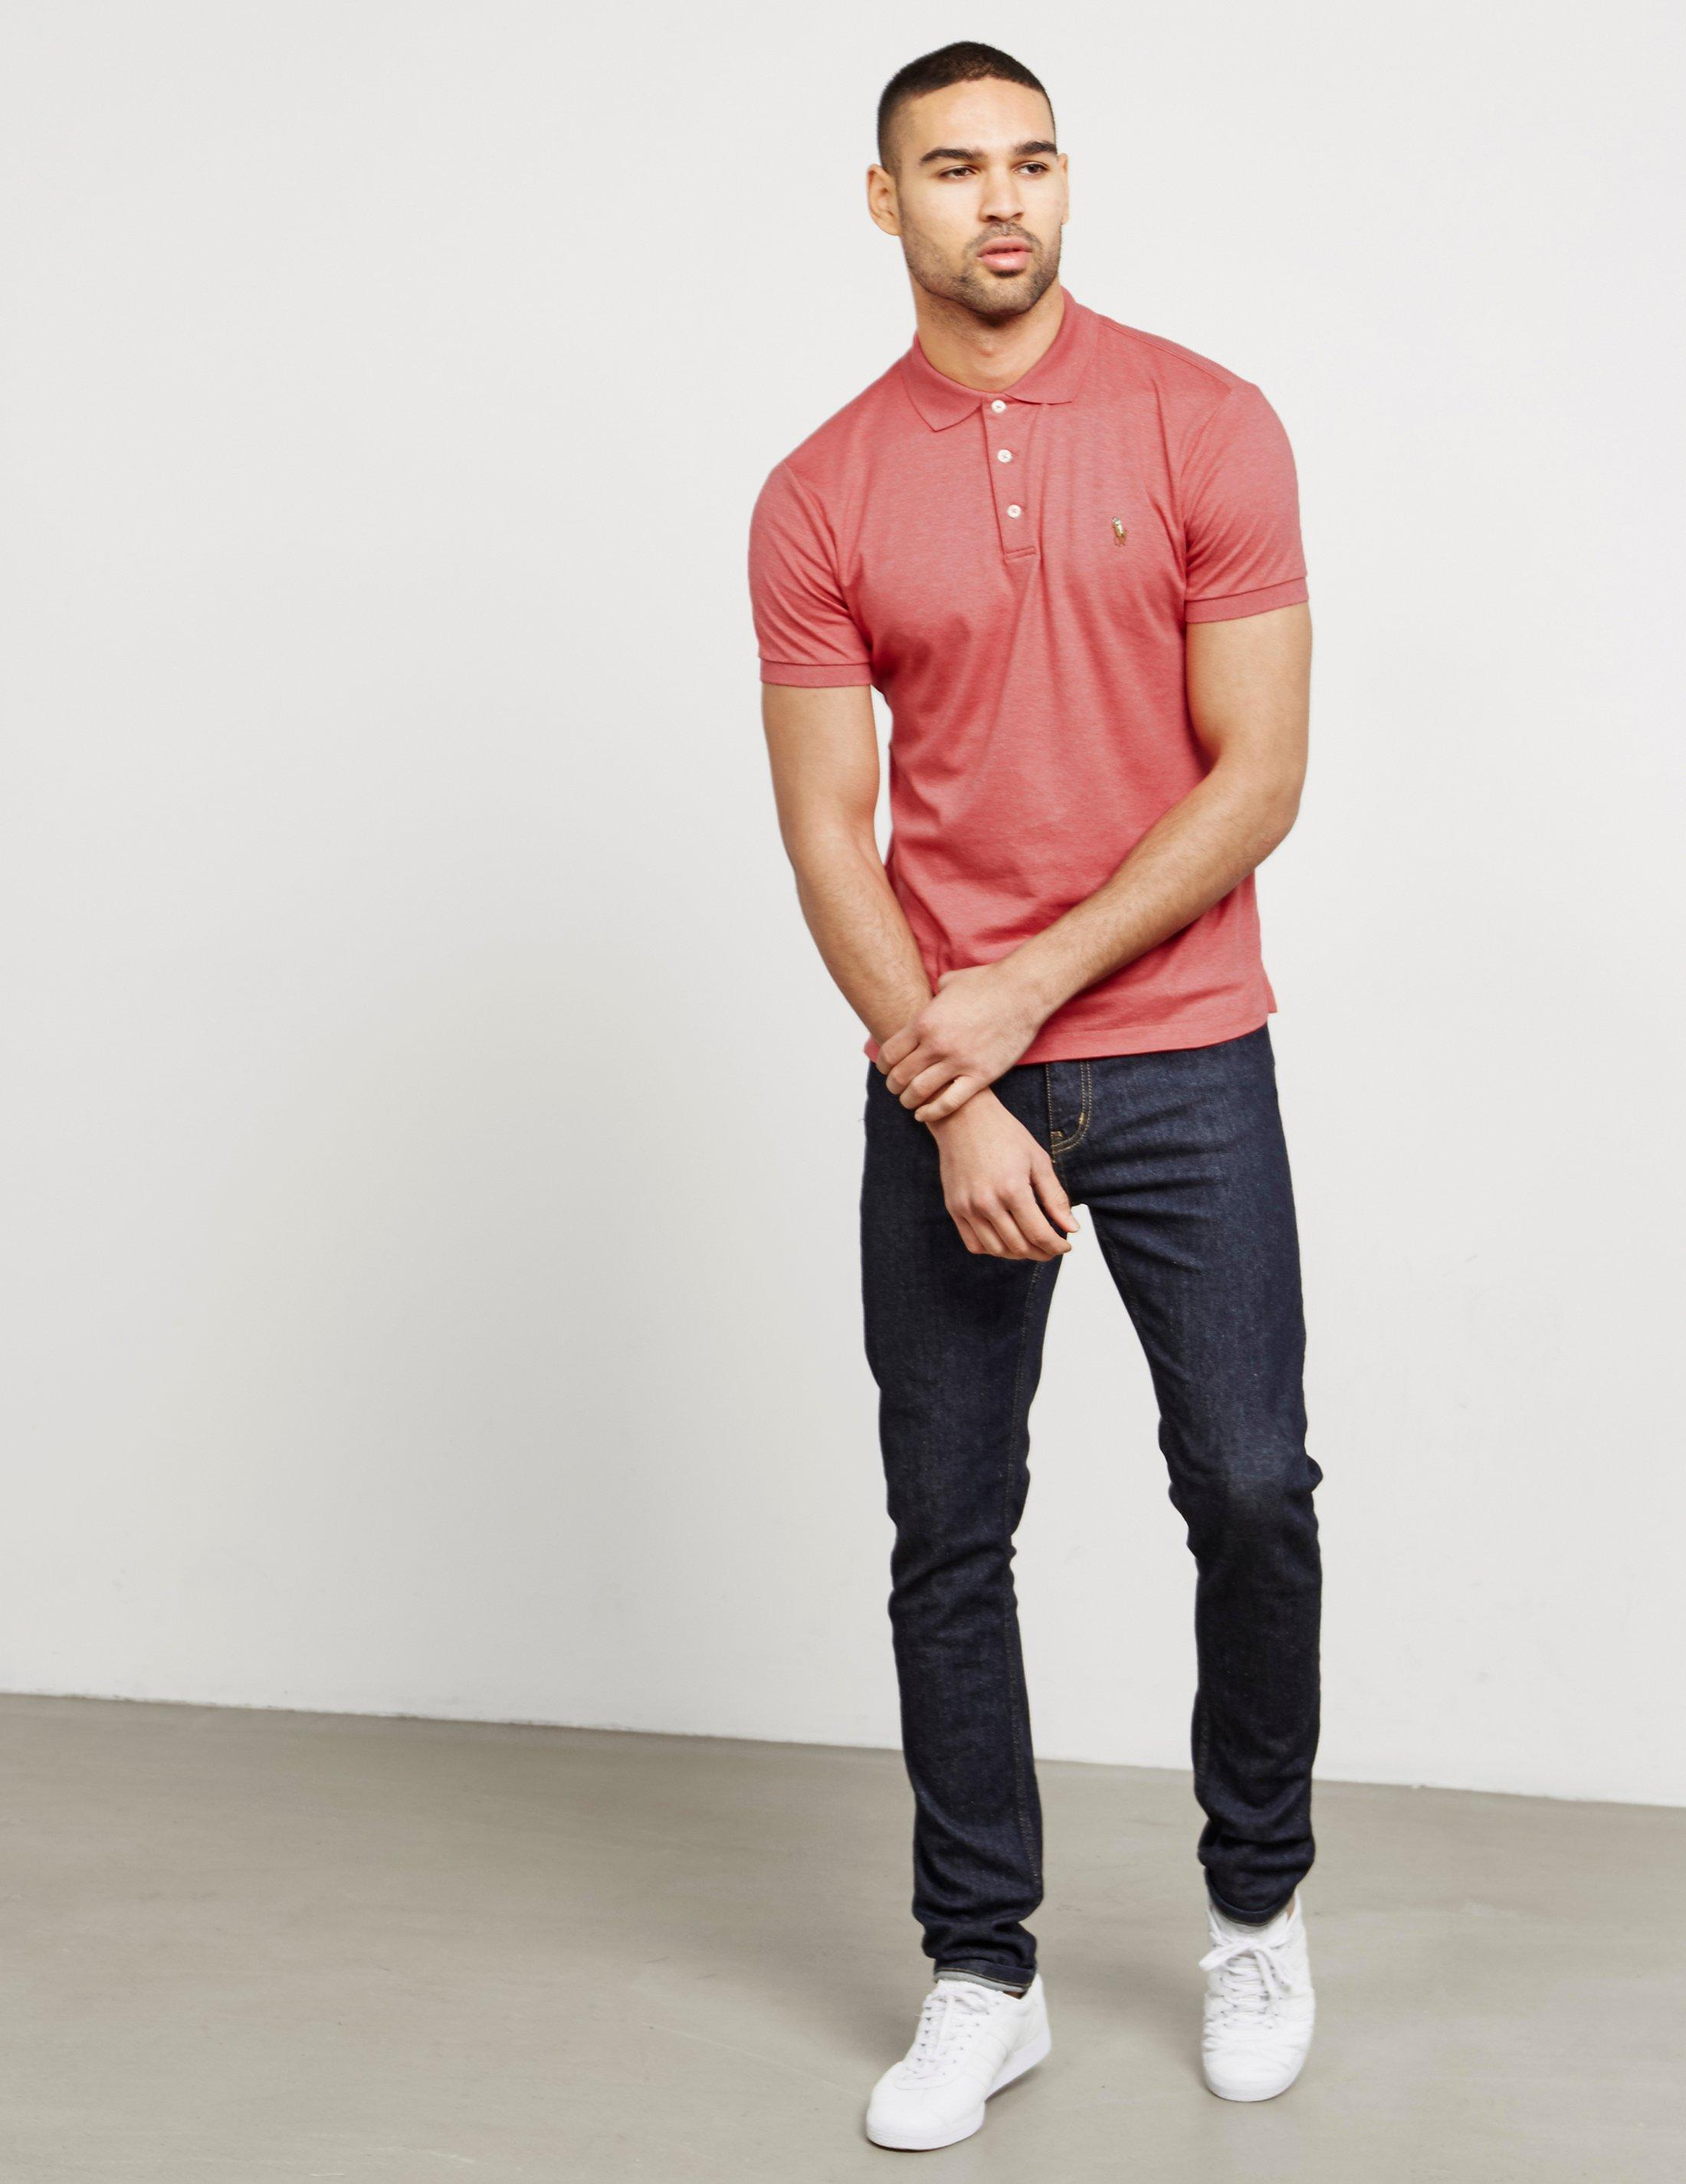 Lyst Polo Ralph Lauren Mens Pima Short Sleeve Polo Shirt Pink In